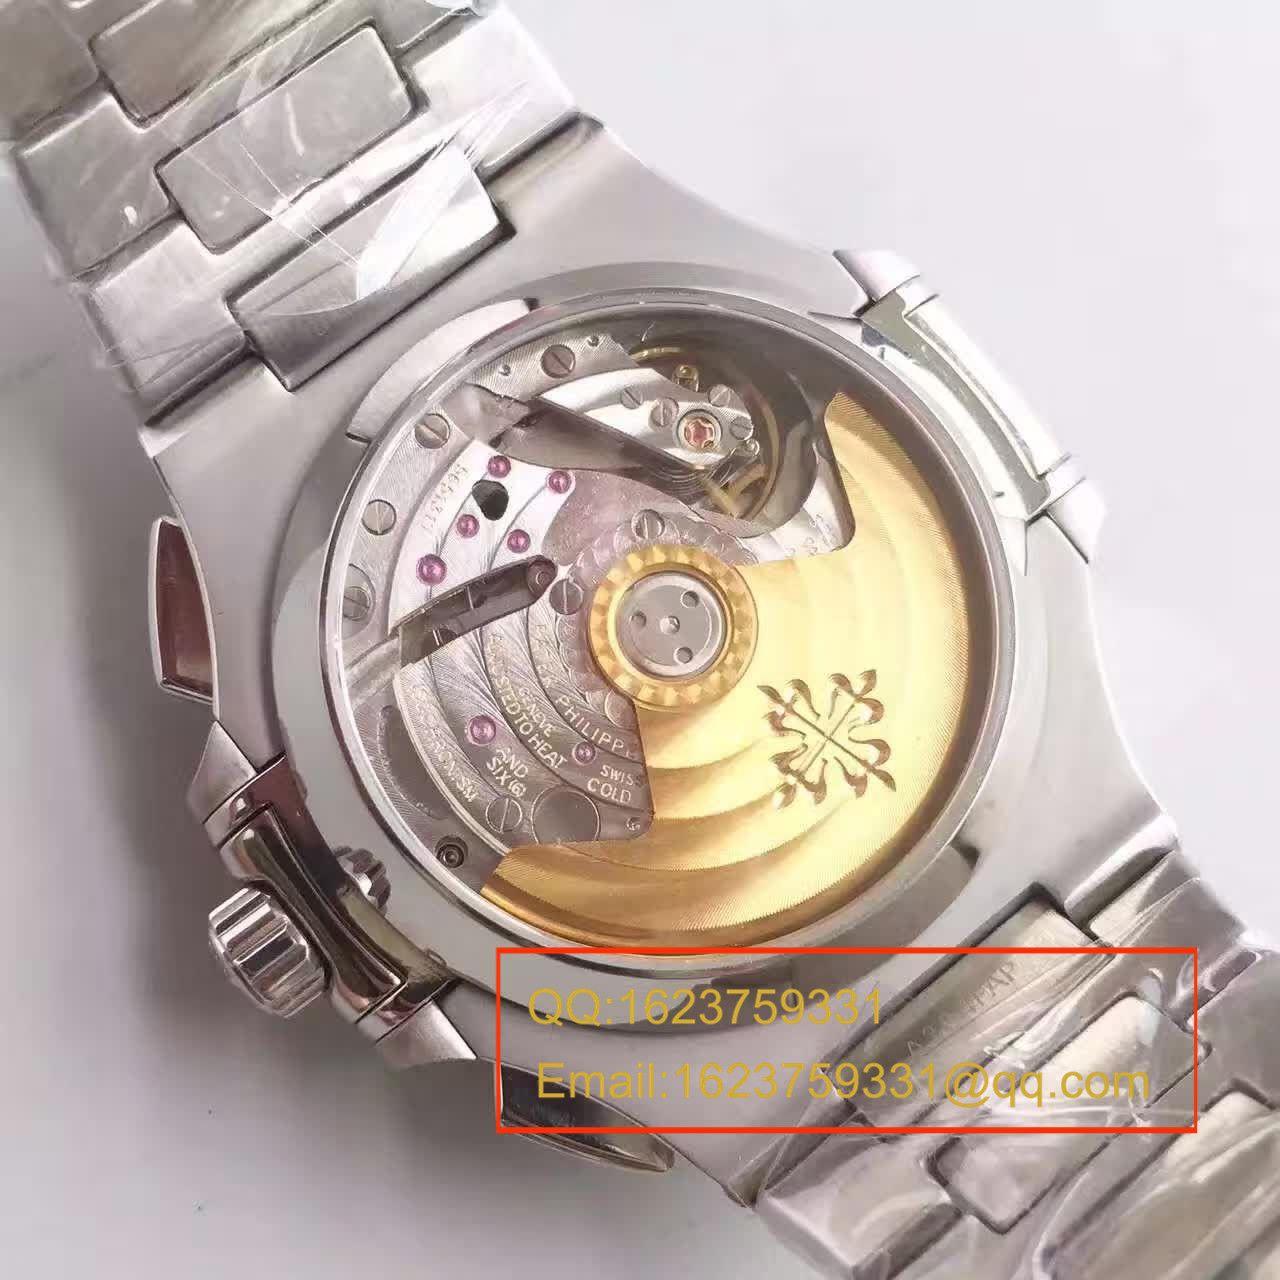 【BP厂超A精仿手表】百达翡丽-Nautilus鹦鹉螺运动系列5980/1A-001机械男表 / BD161A